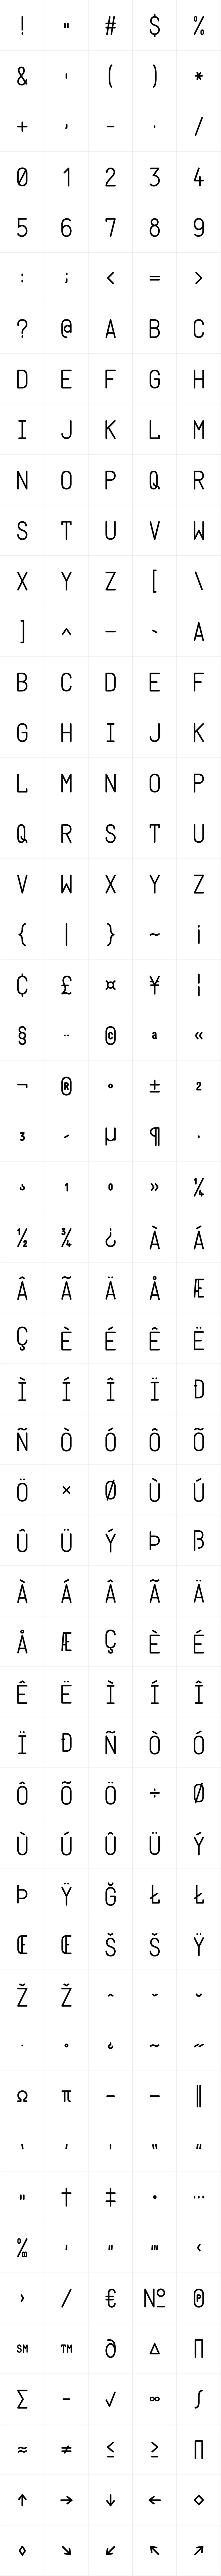 Donagram